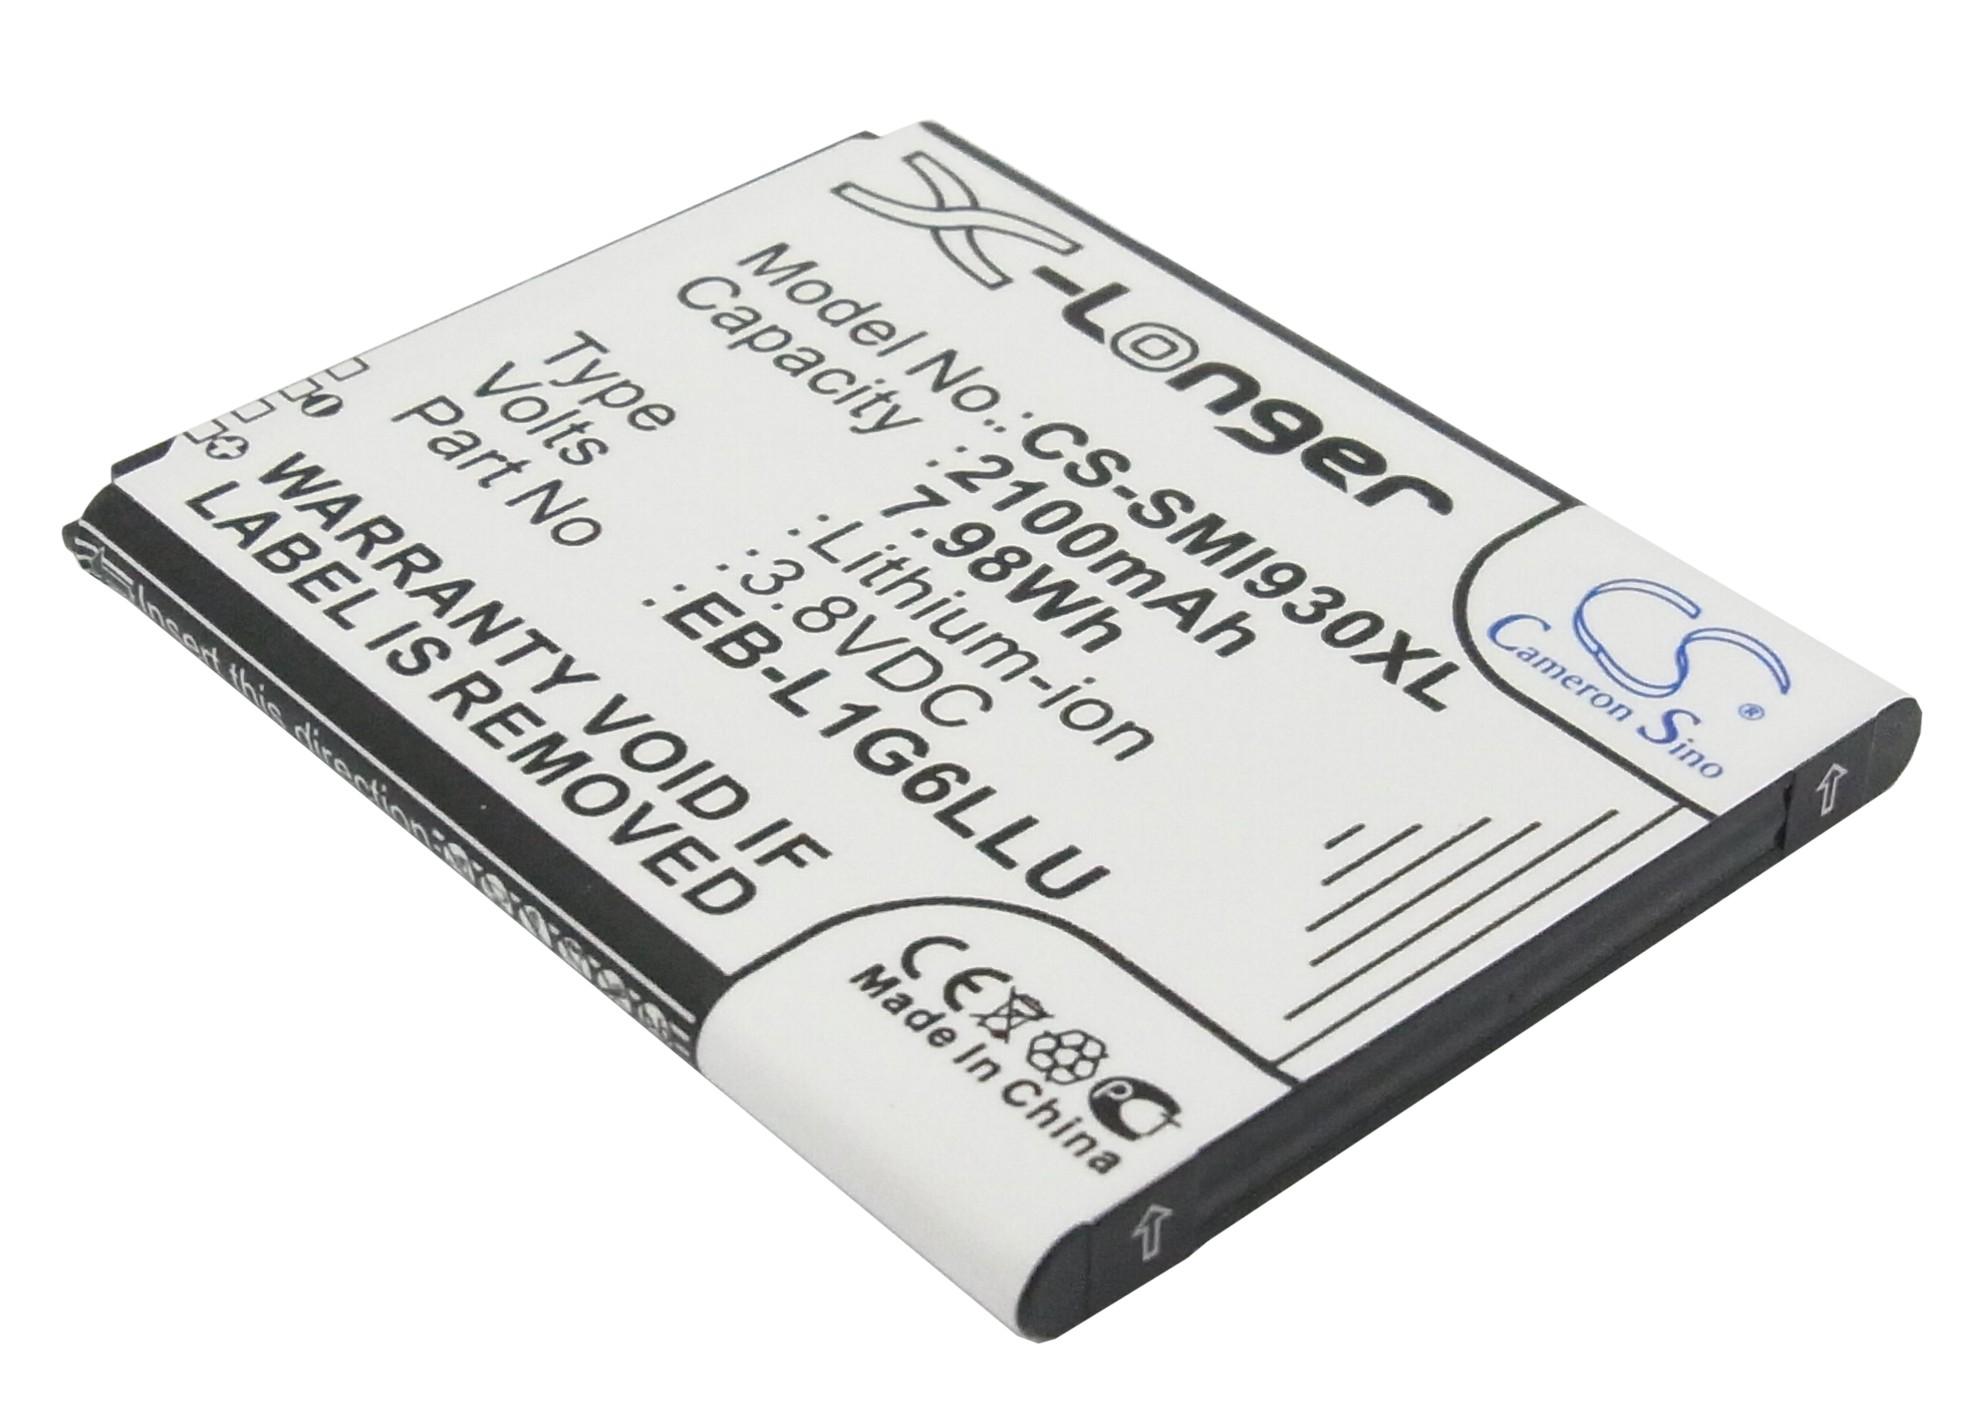 Cameron Sino baterie do mobilů pro SAMSUNG GT-i9305 3.8V Li-ion 2100mAh černá - neoriginální